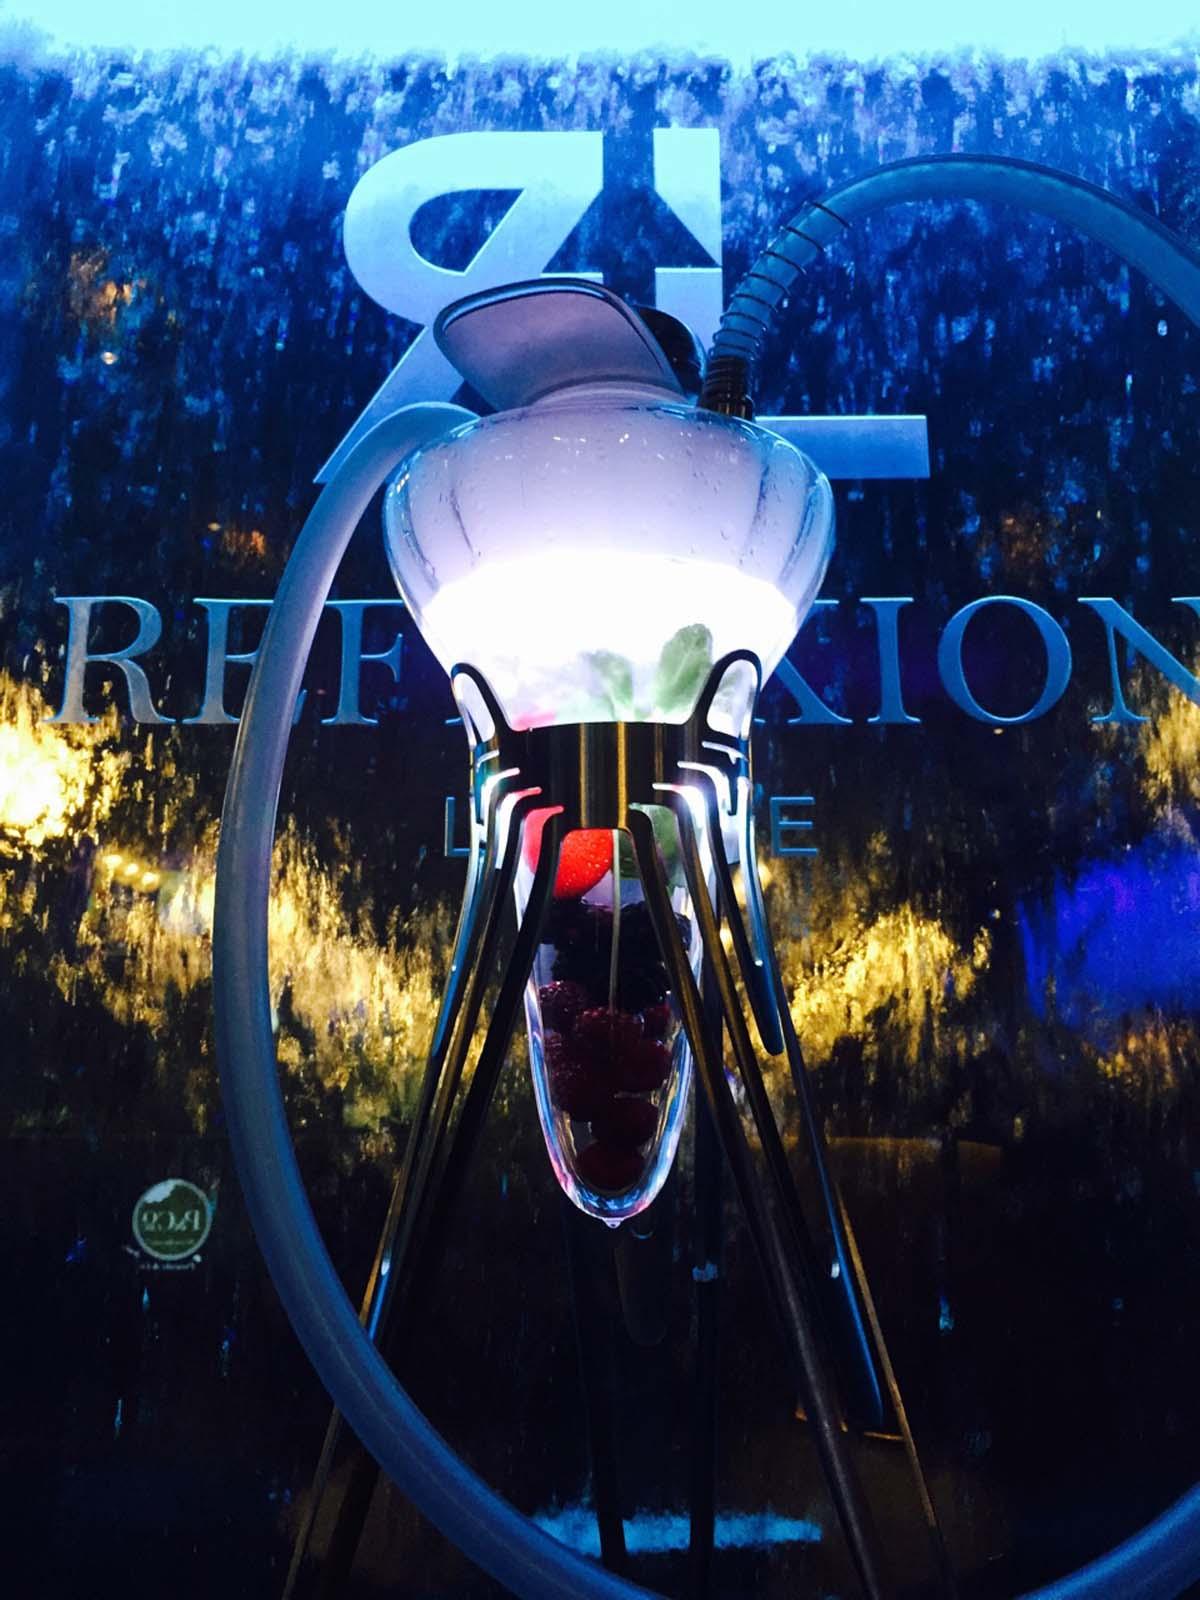 Meduse Reflexion Lounge